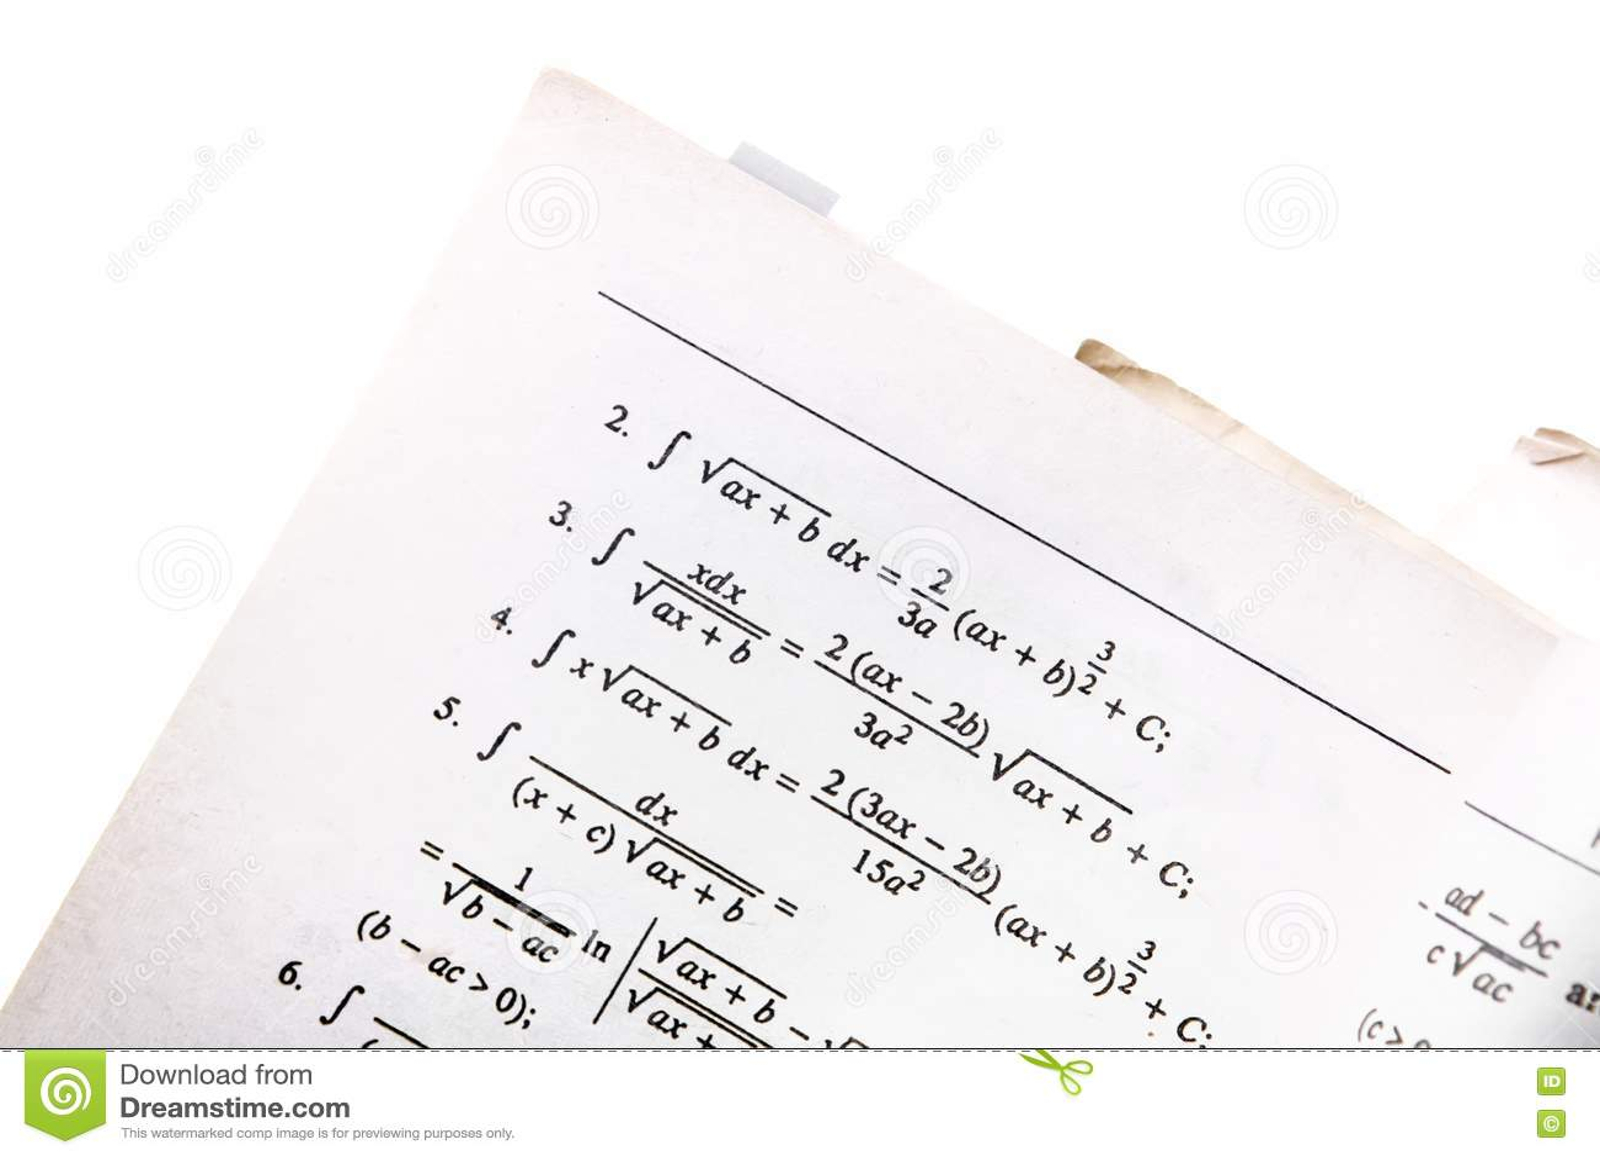 Math Book Closeup Picture. Image: 8595139